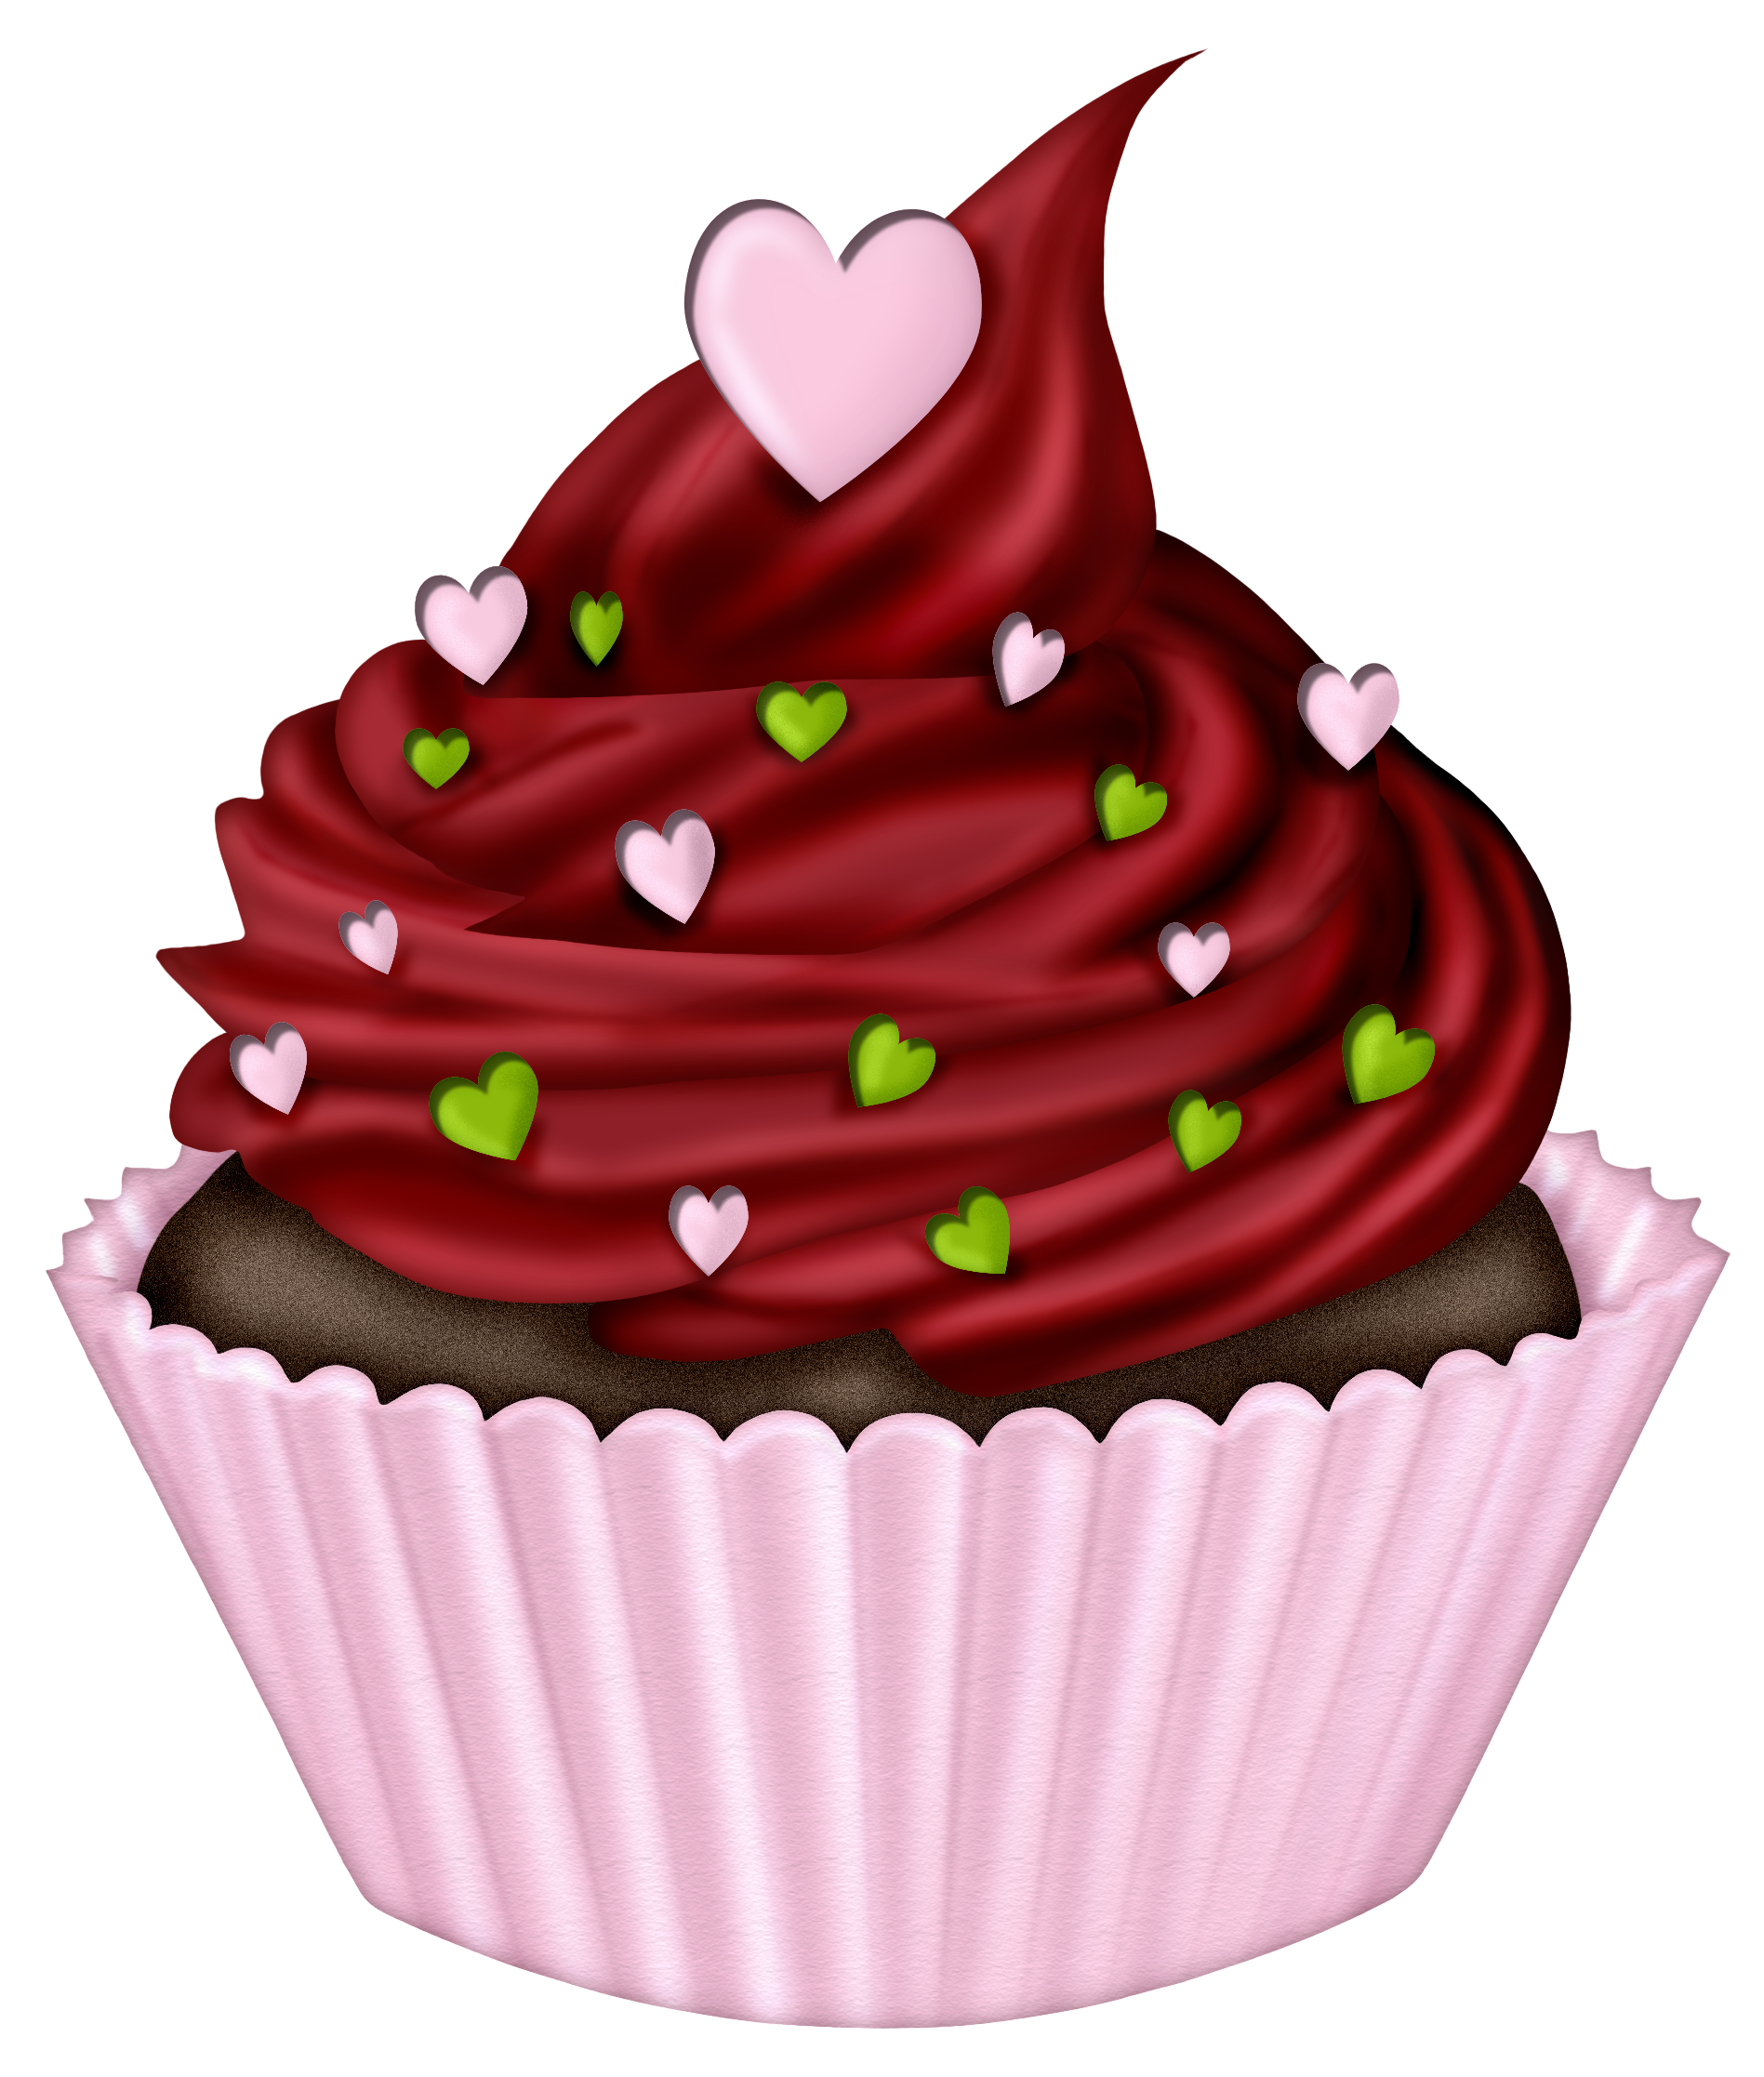 Cupcakes Digis Cupcake Clipart Cupcake